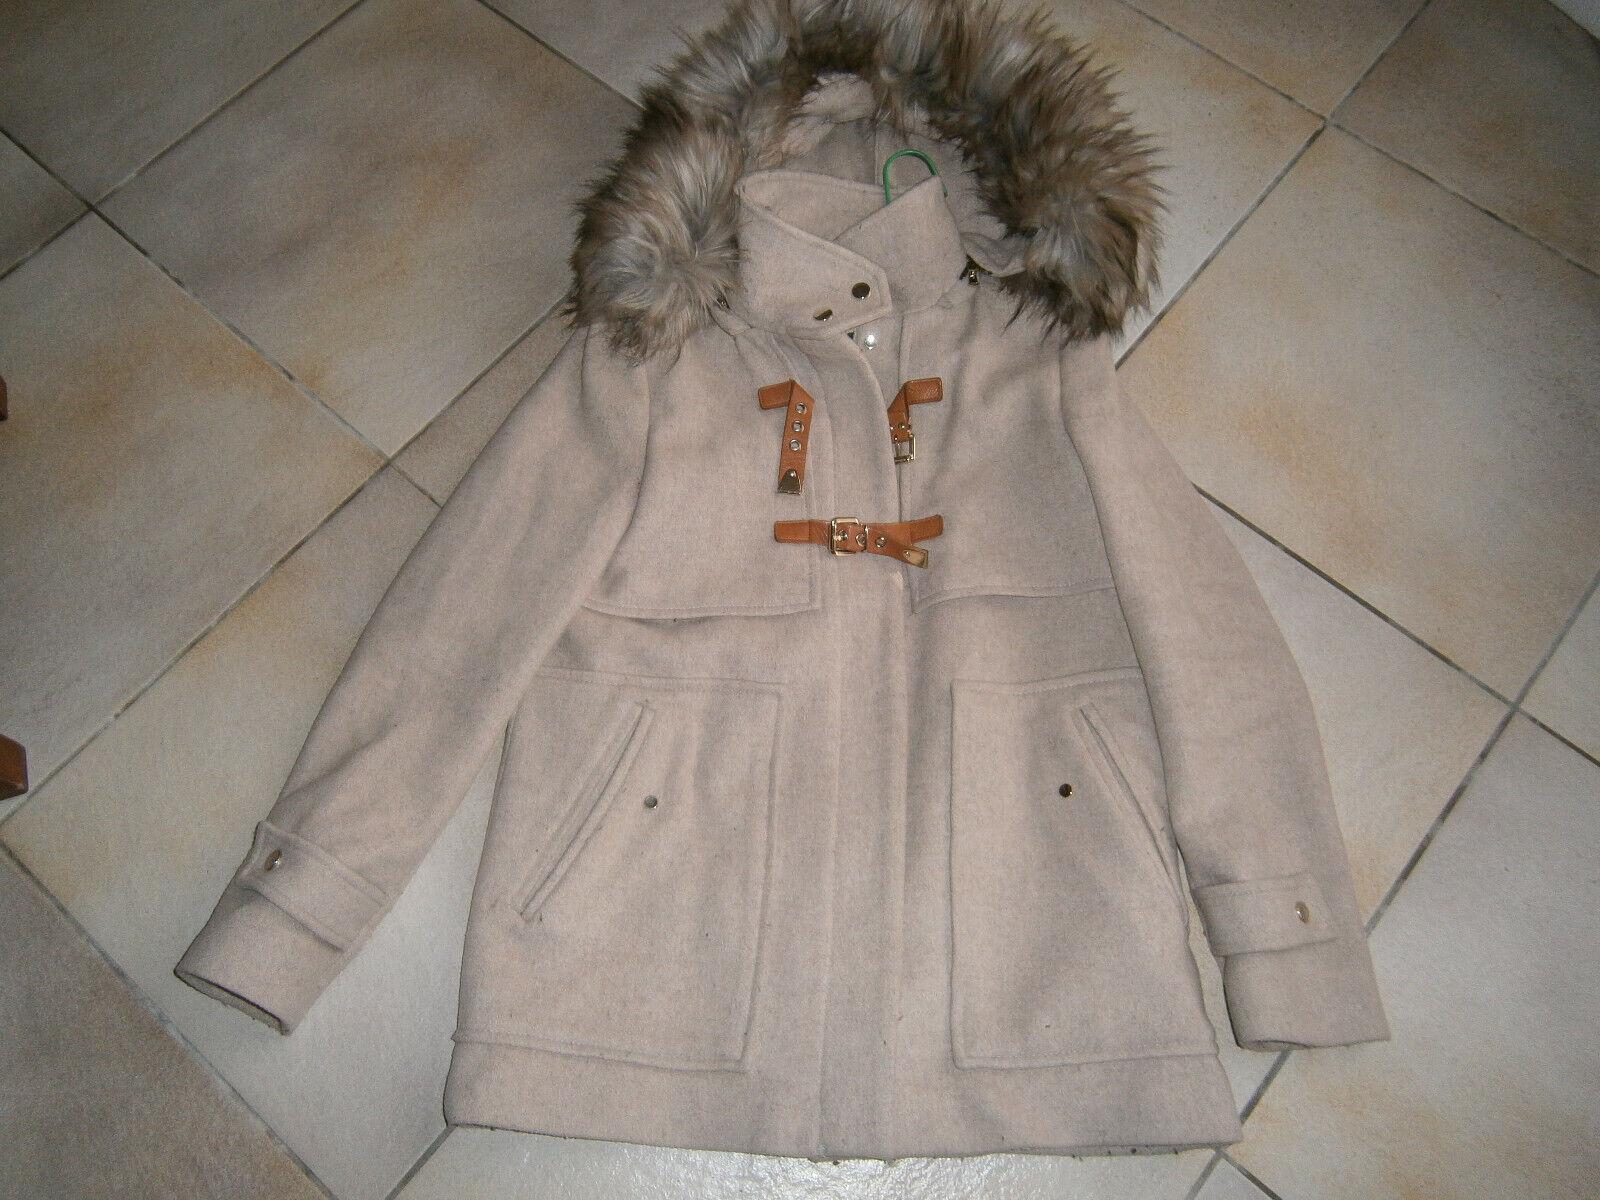 Manteau duffle coat beige marque zara taille m a capuche